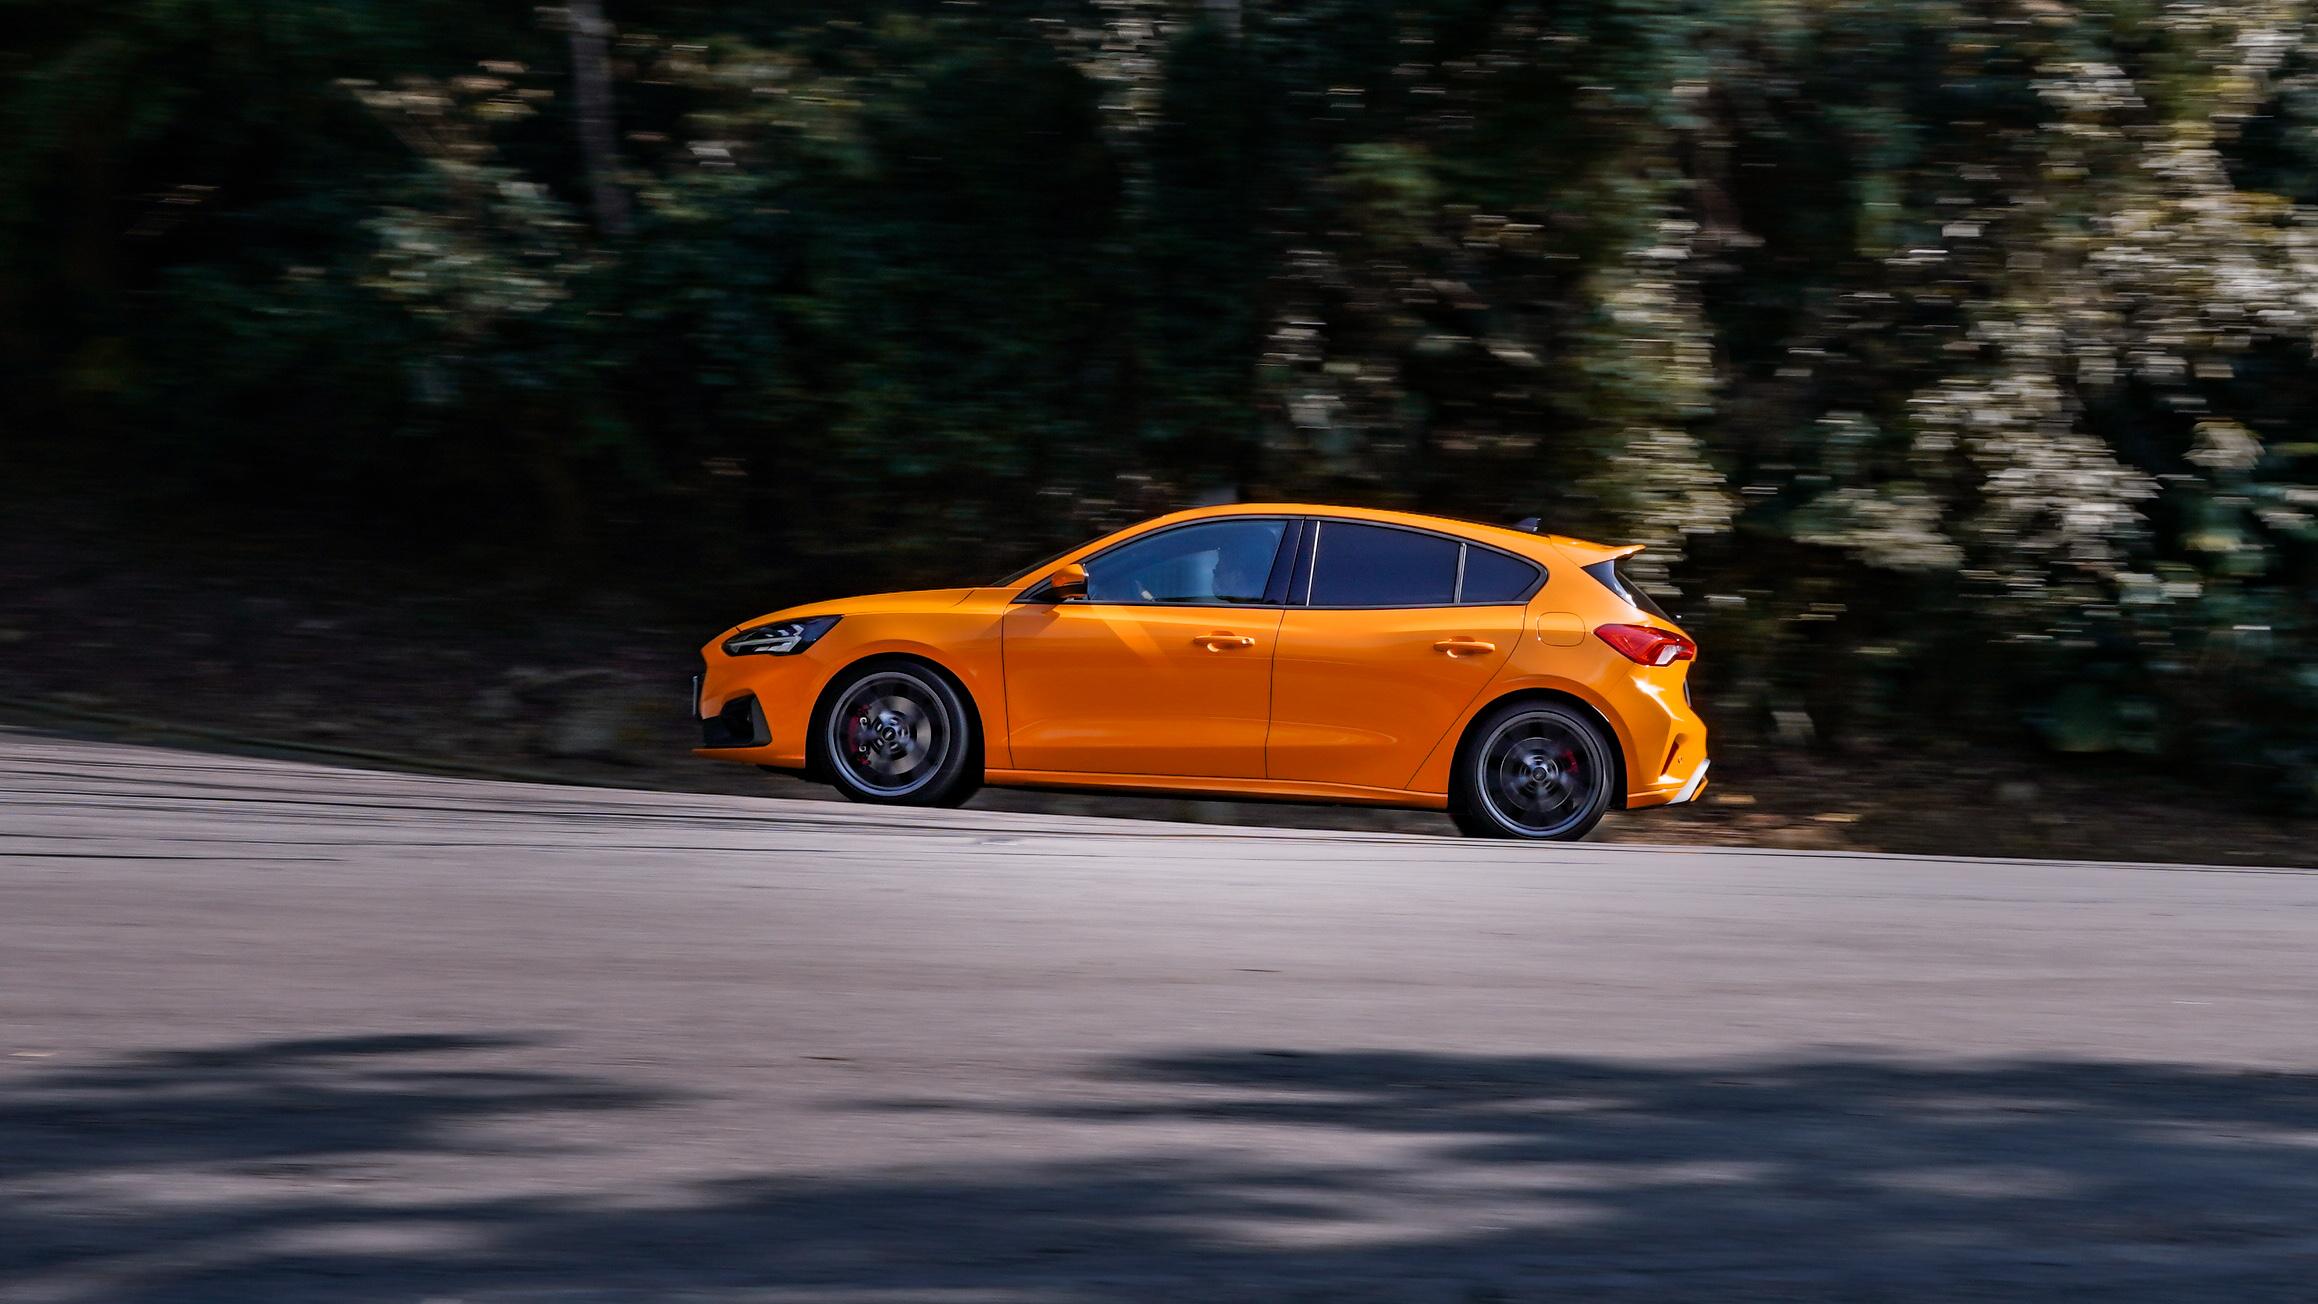 試駕車色為 Orange Fury 憤怒橘色。